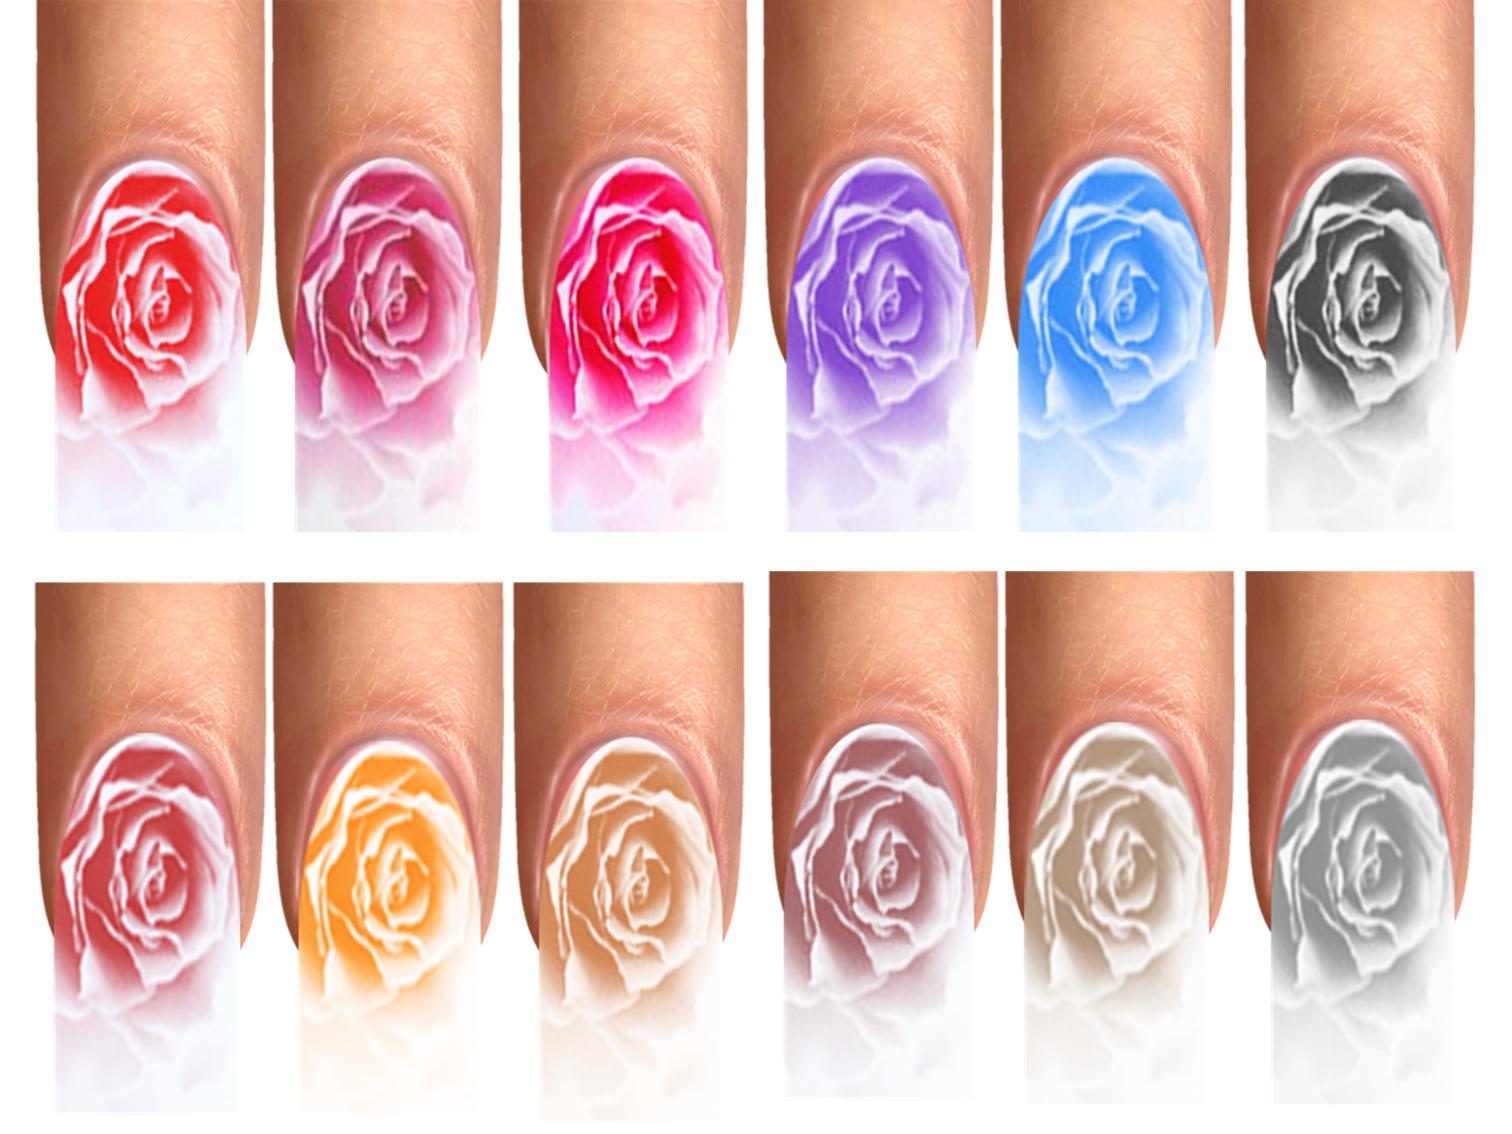 Wraps Nail Art Tattoos Fullcover Flower Style Blüte Blumen Rosen Rot Pink XS-XL